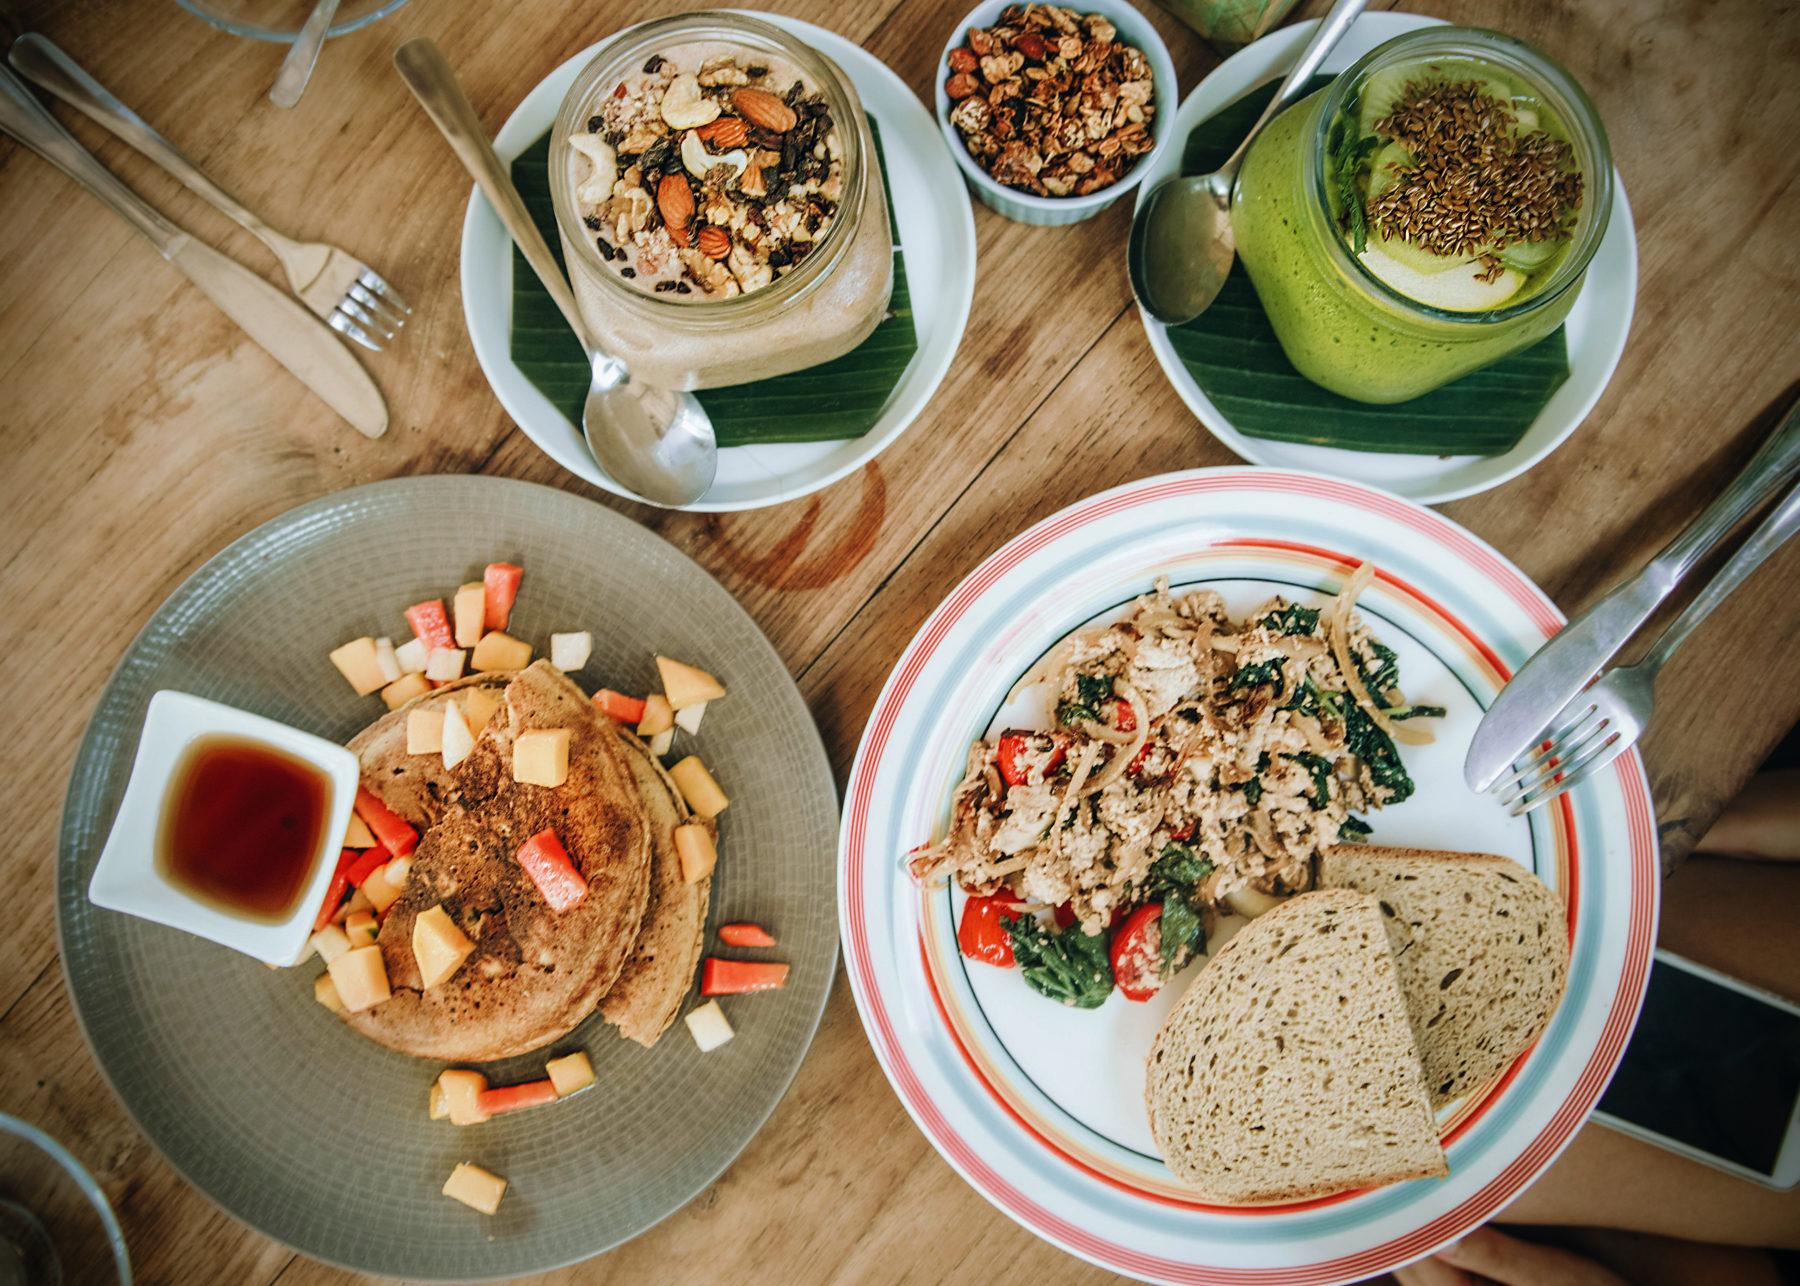 vegan healthy food in gili islands pitu cafe indonesia jackfruit curry scrambled tofu smoothie bowls